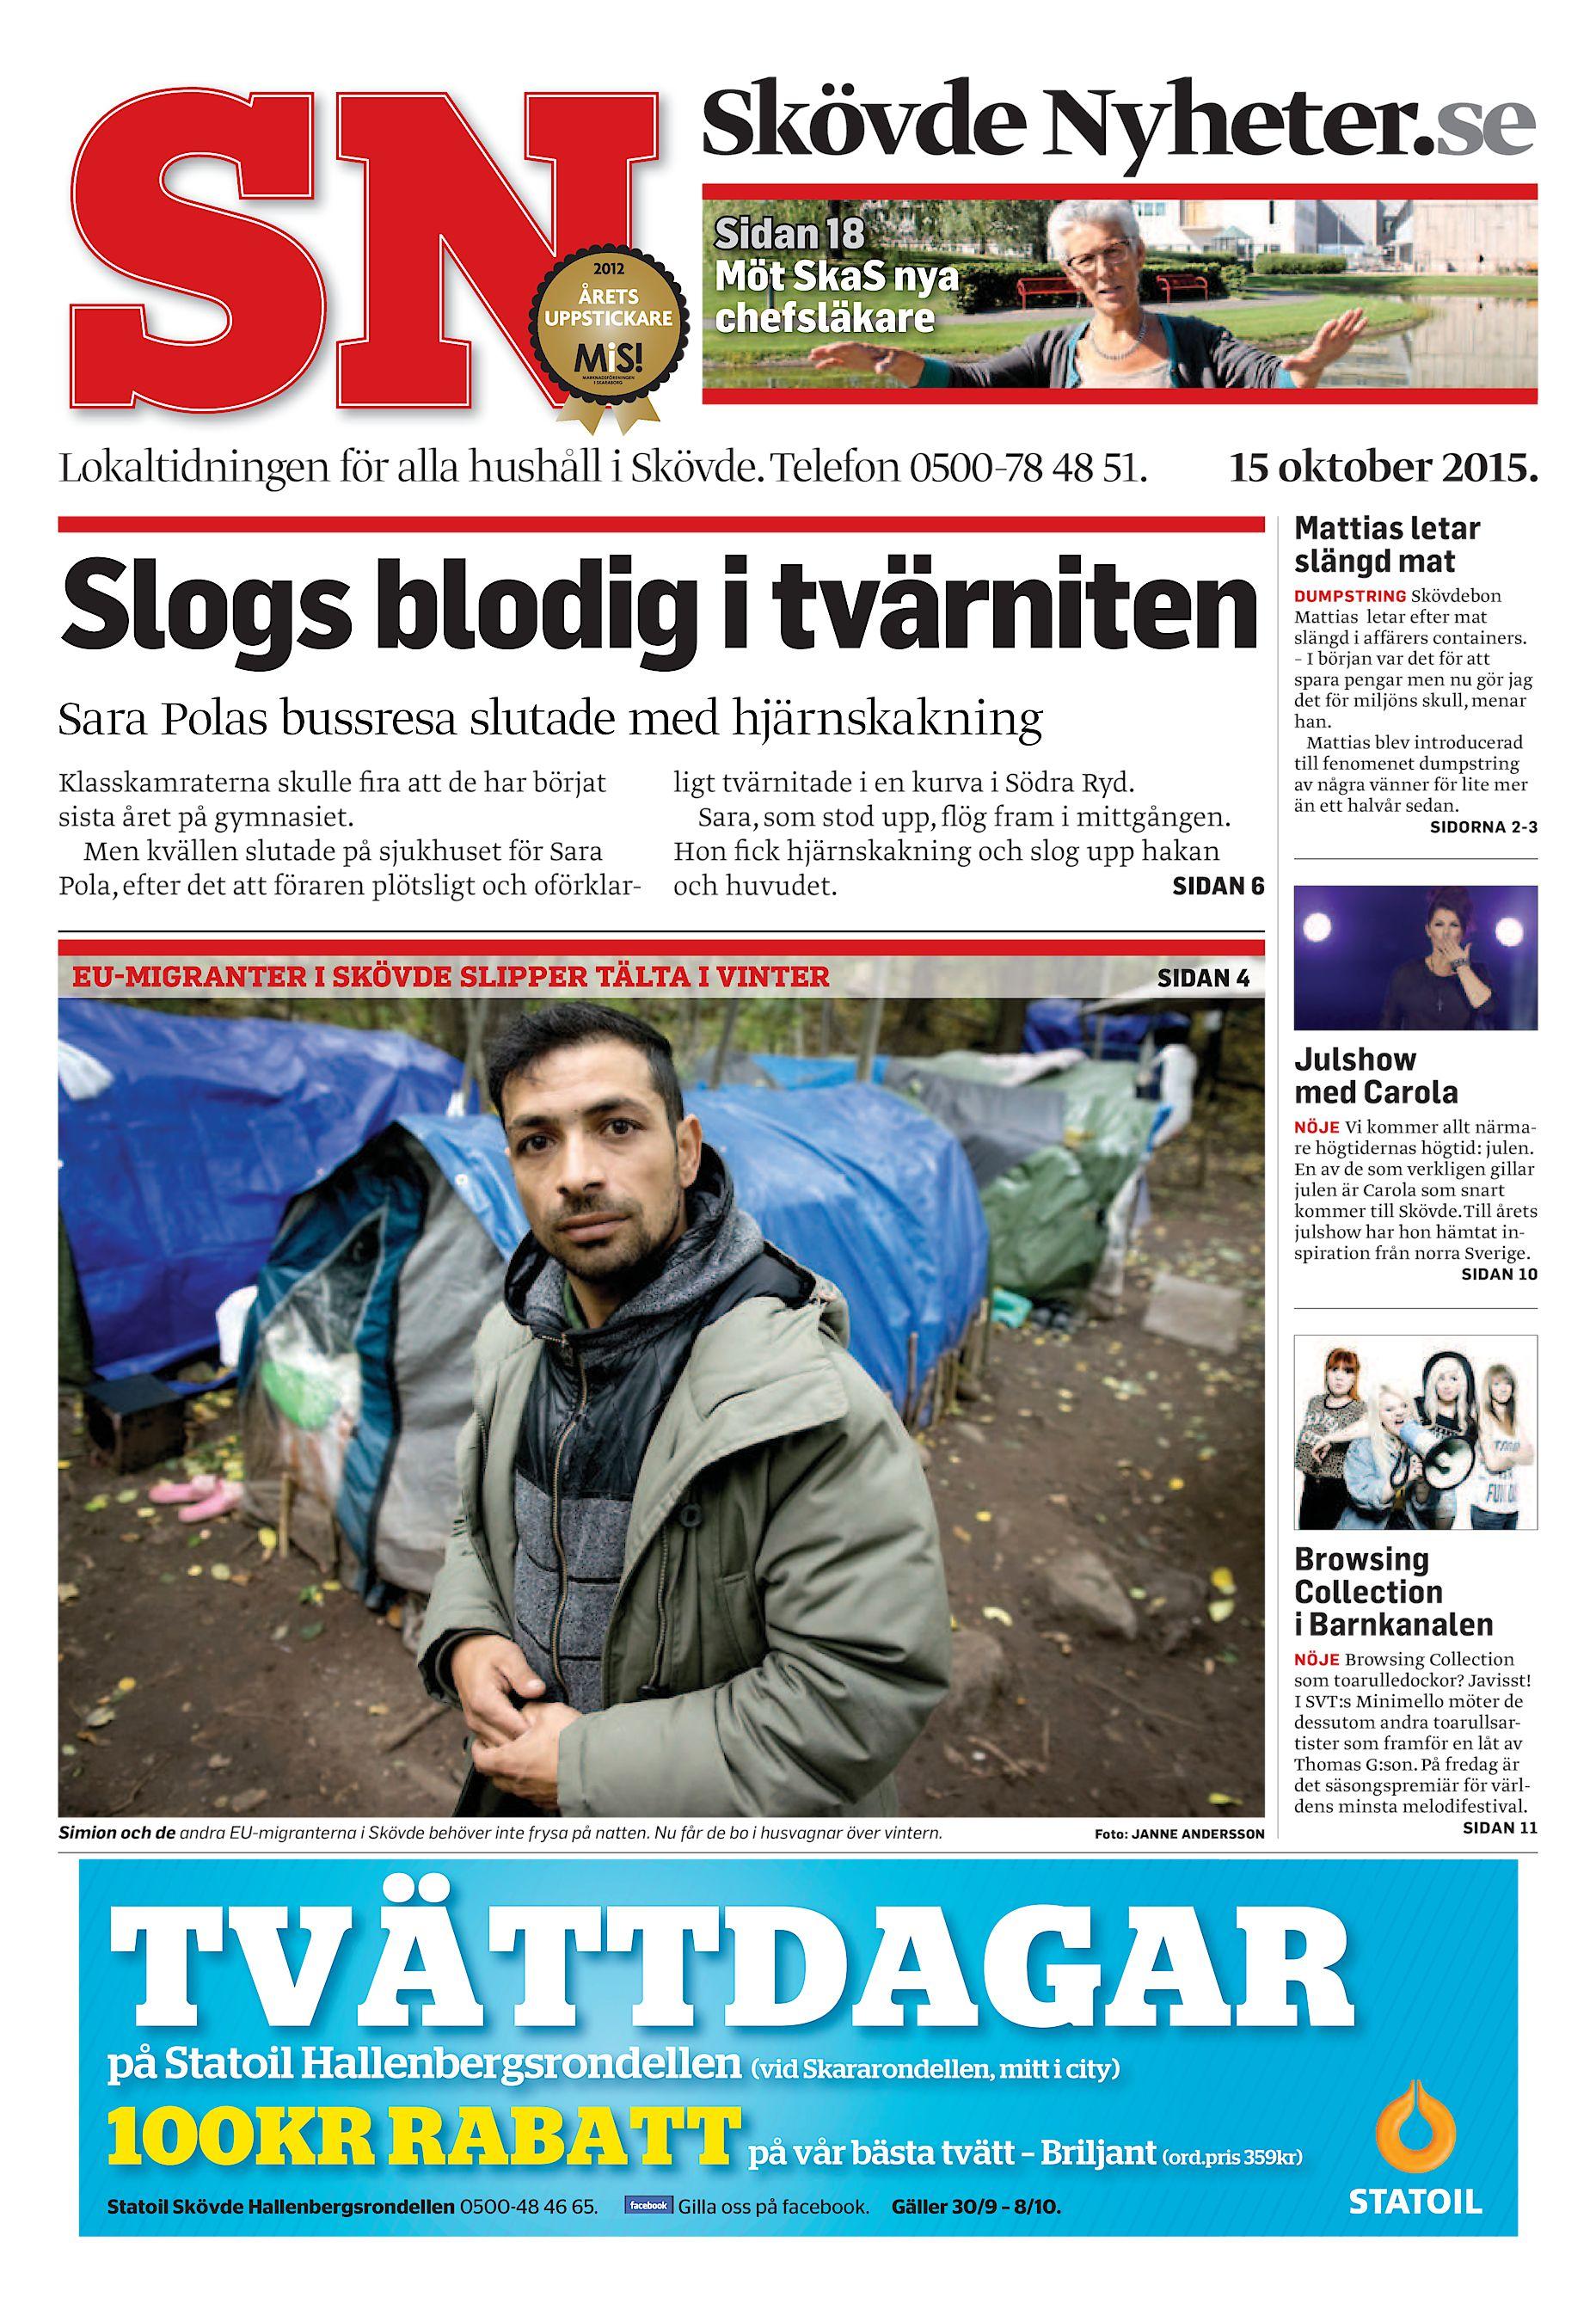 Skövde Nyheter SN-20151015 (endast text) 2e71496f7dc9f